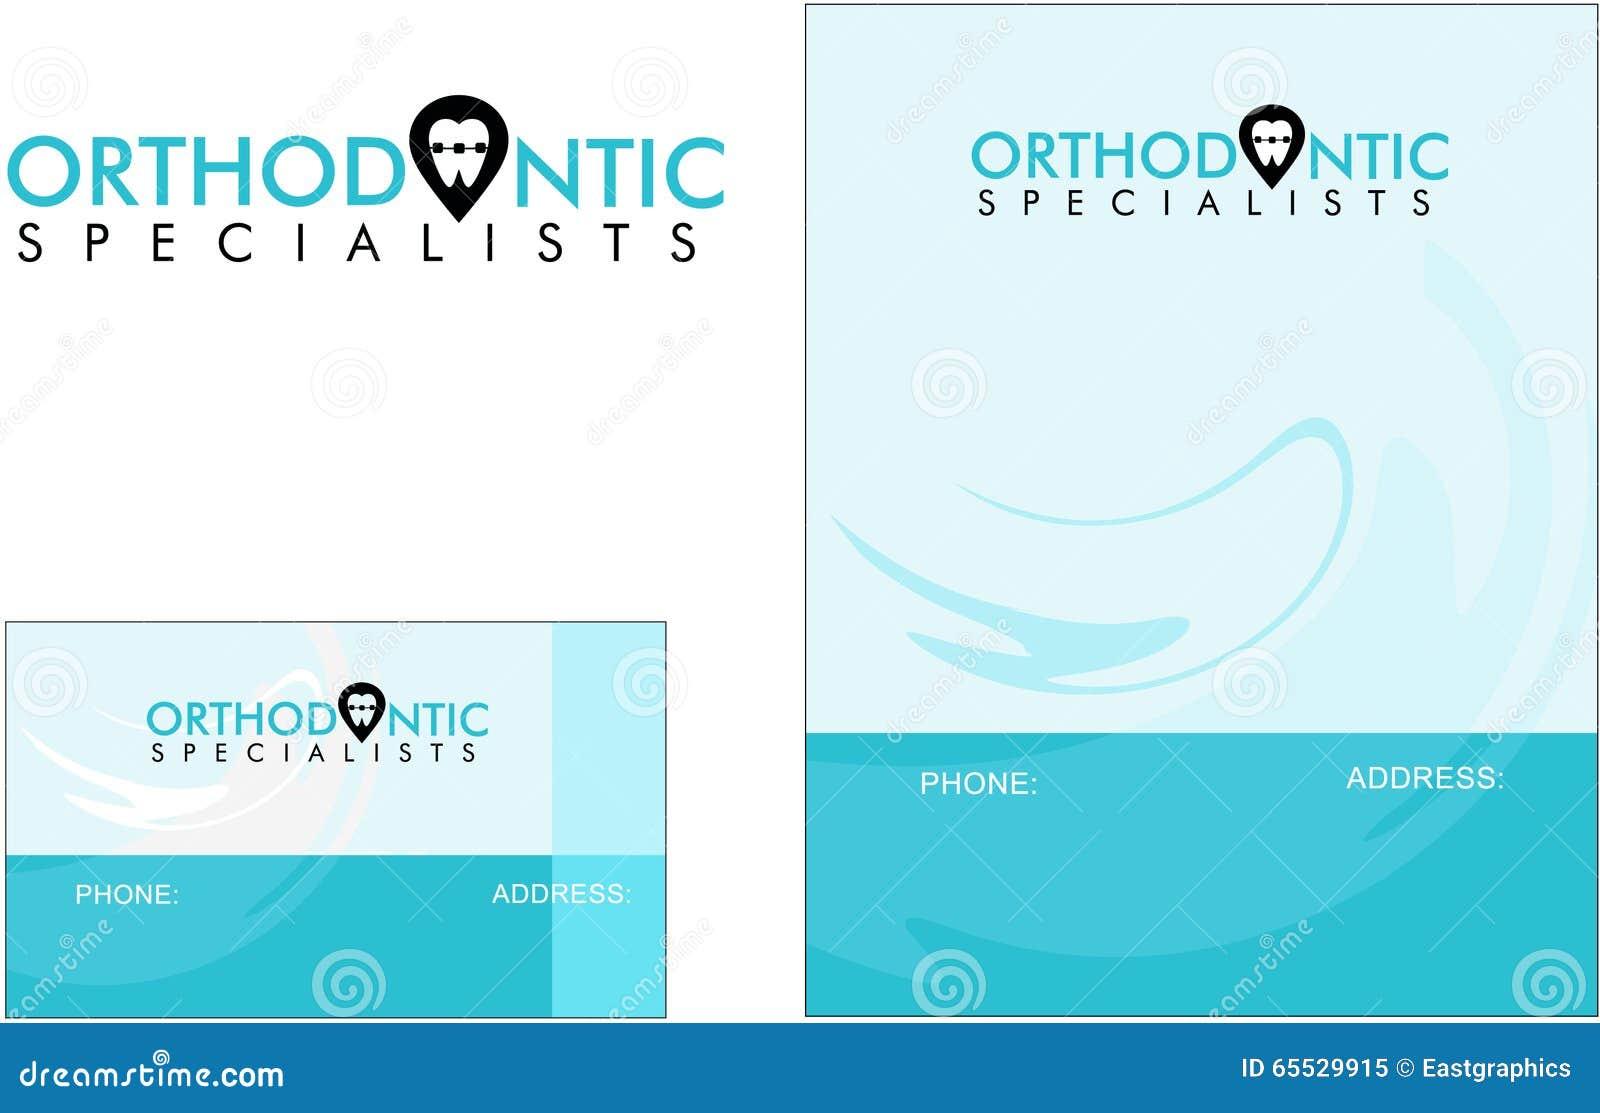 Orthodontic dentist doctor medicine modern logo business card royalty free vector download orthodontic dentist doctor medicine modern logo business card magicingreecefo Images